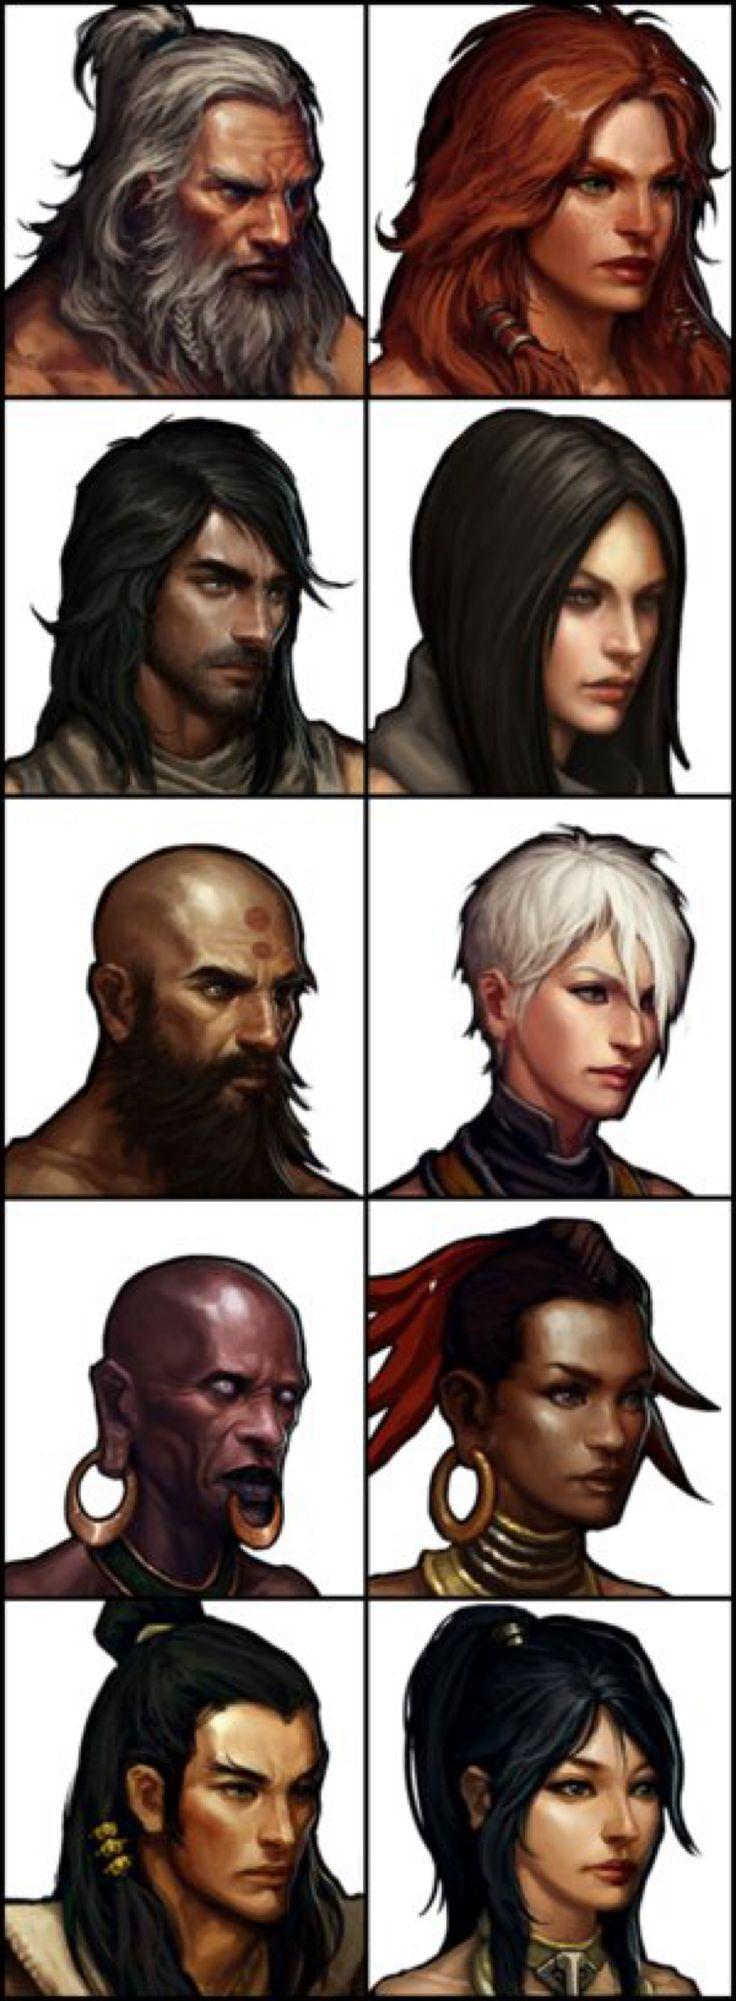 Diablo 3 Classes by deamen1989 on @DeviantArt  Daemon hunter hair but cooler wig-red tips?